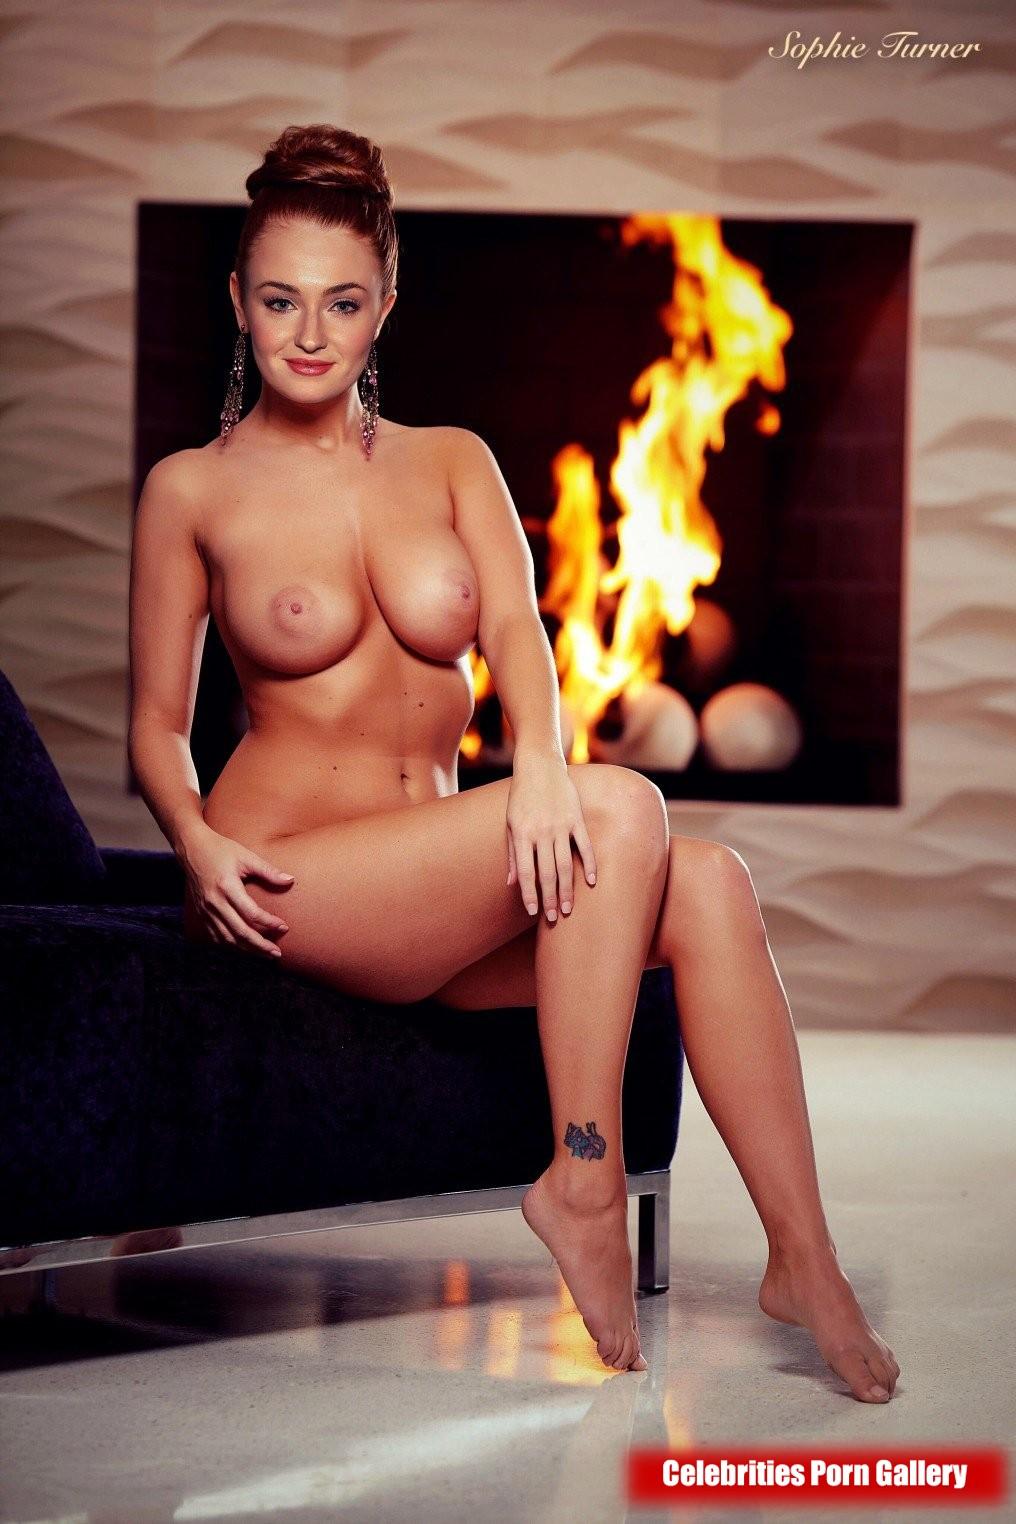 Stars Celebrity Nude Body Paint Pics